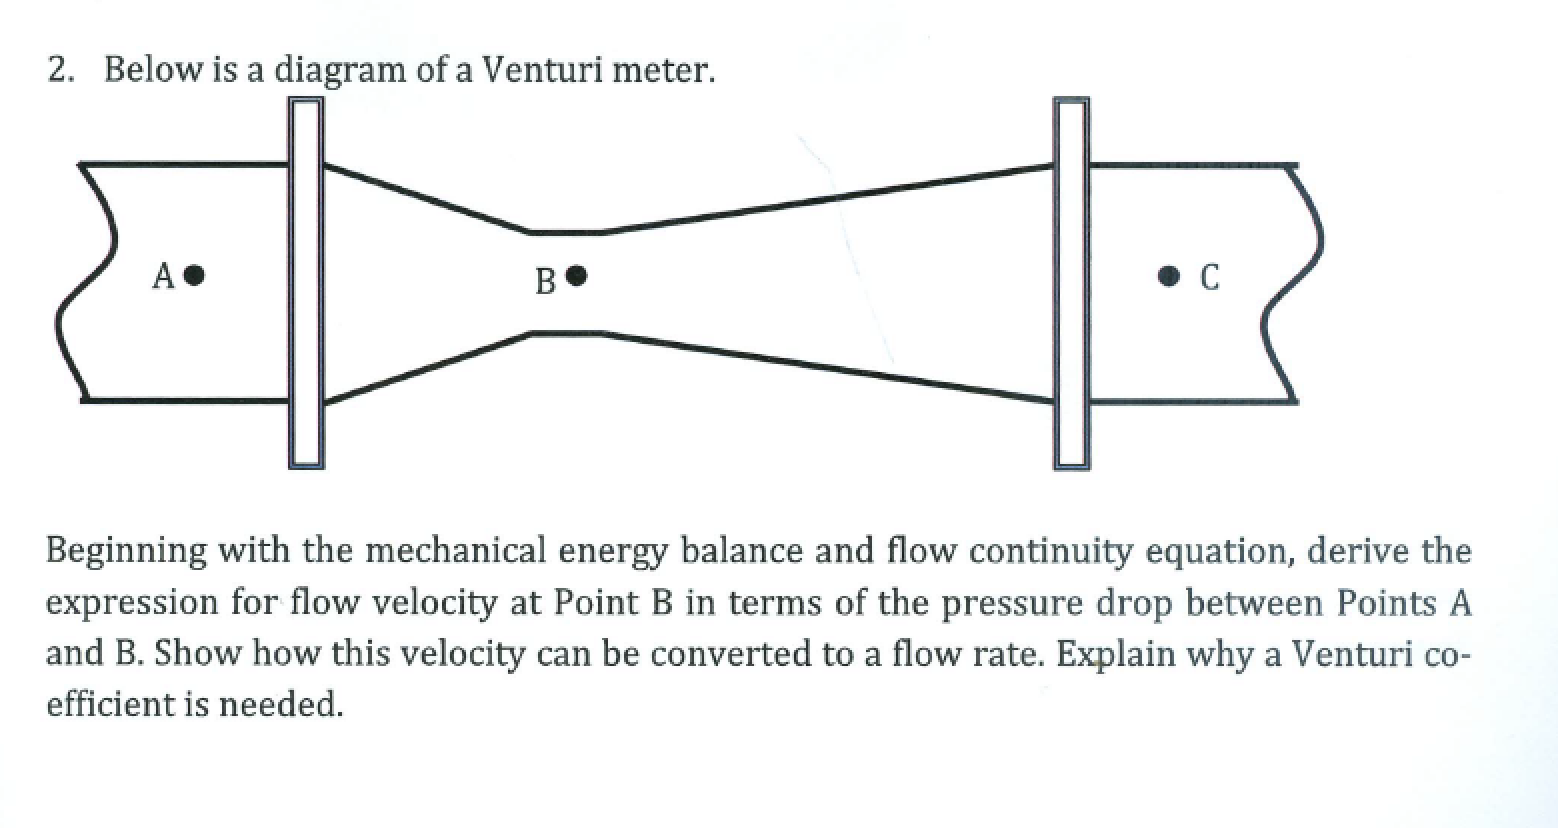 venturi diagram solved 2 below is a diagram of a venturi meter    begin  diagram of a venturi meter